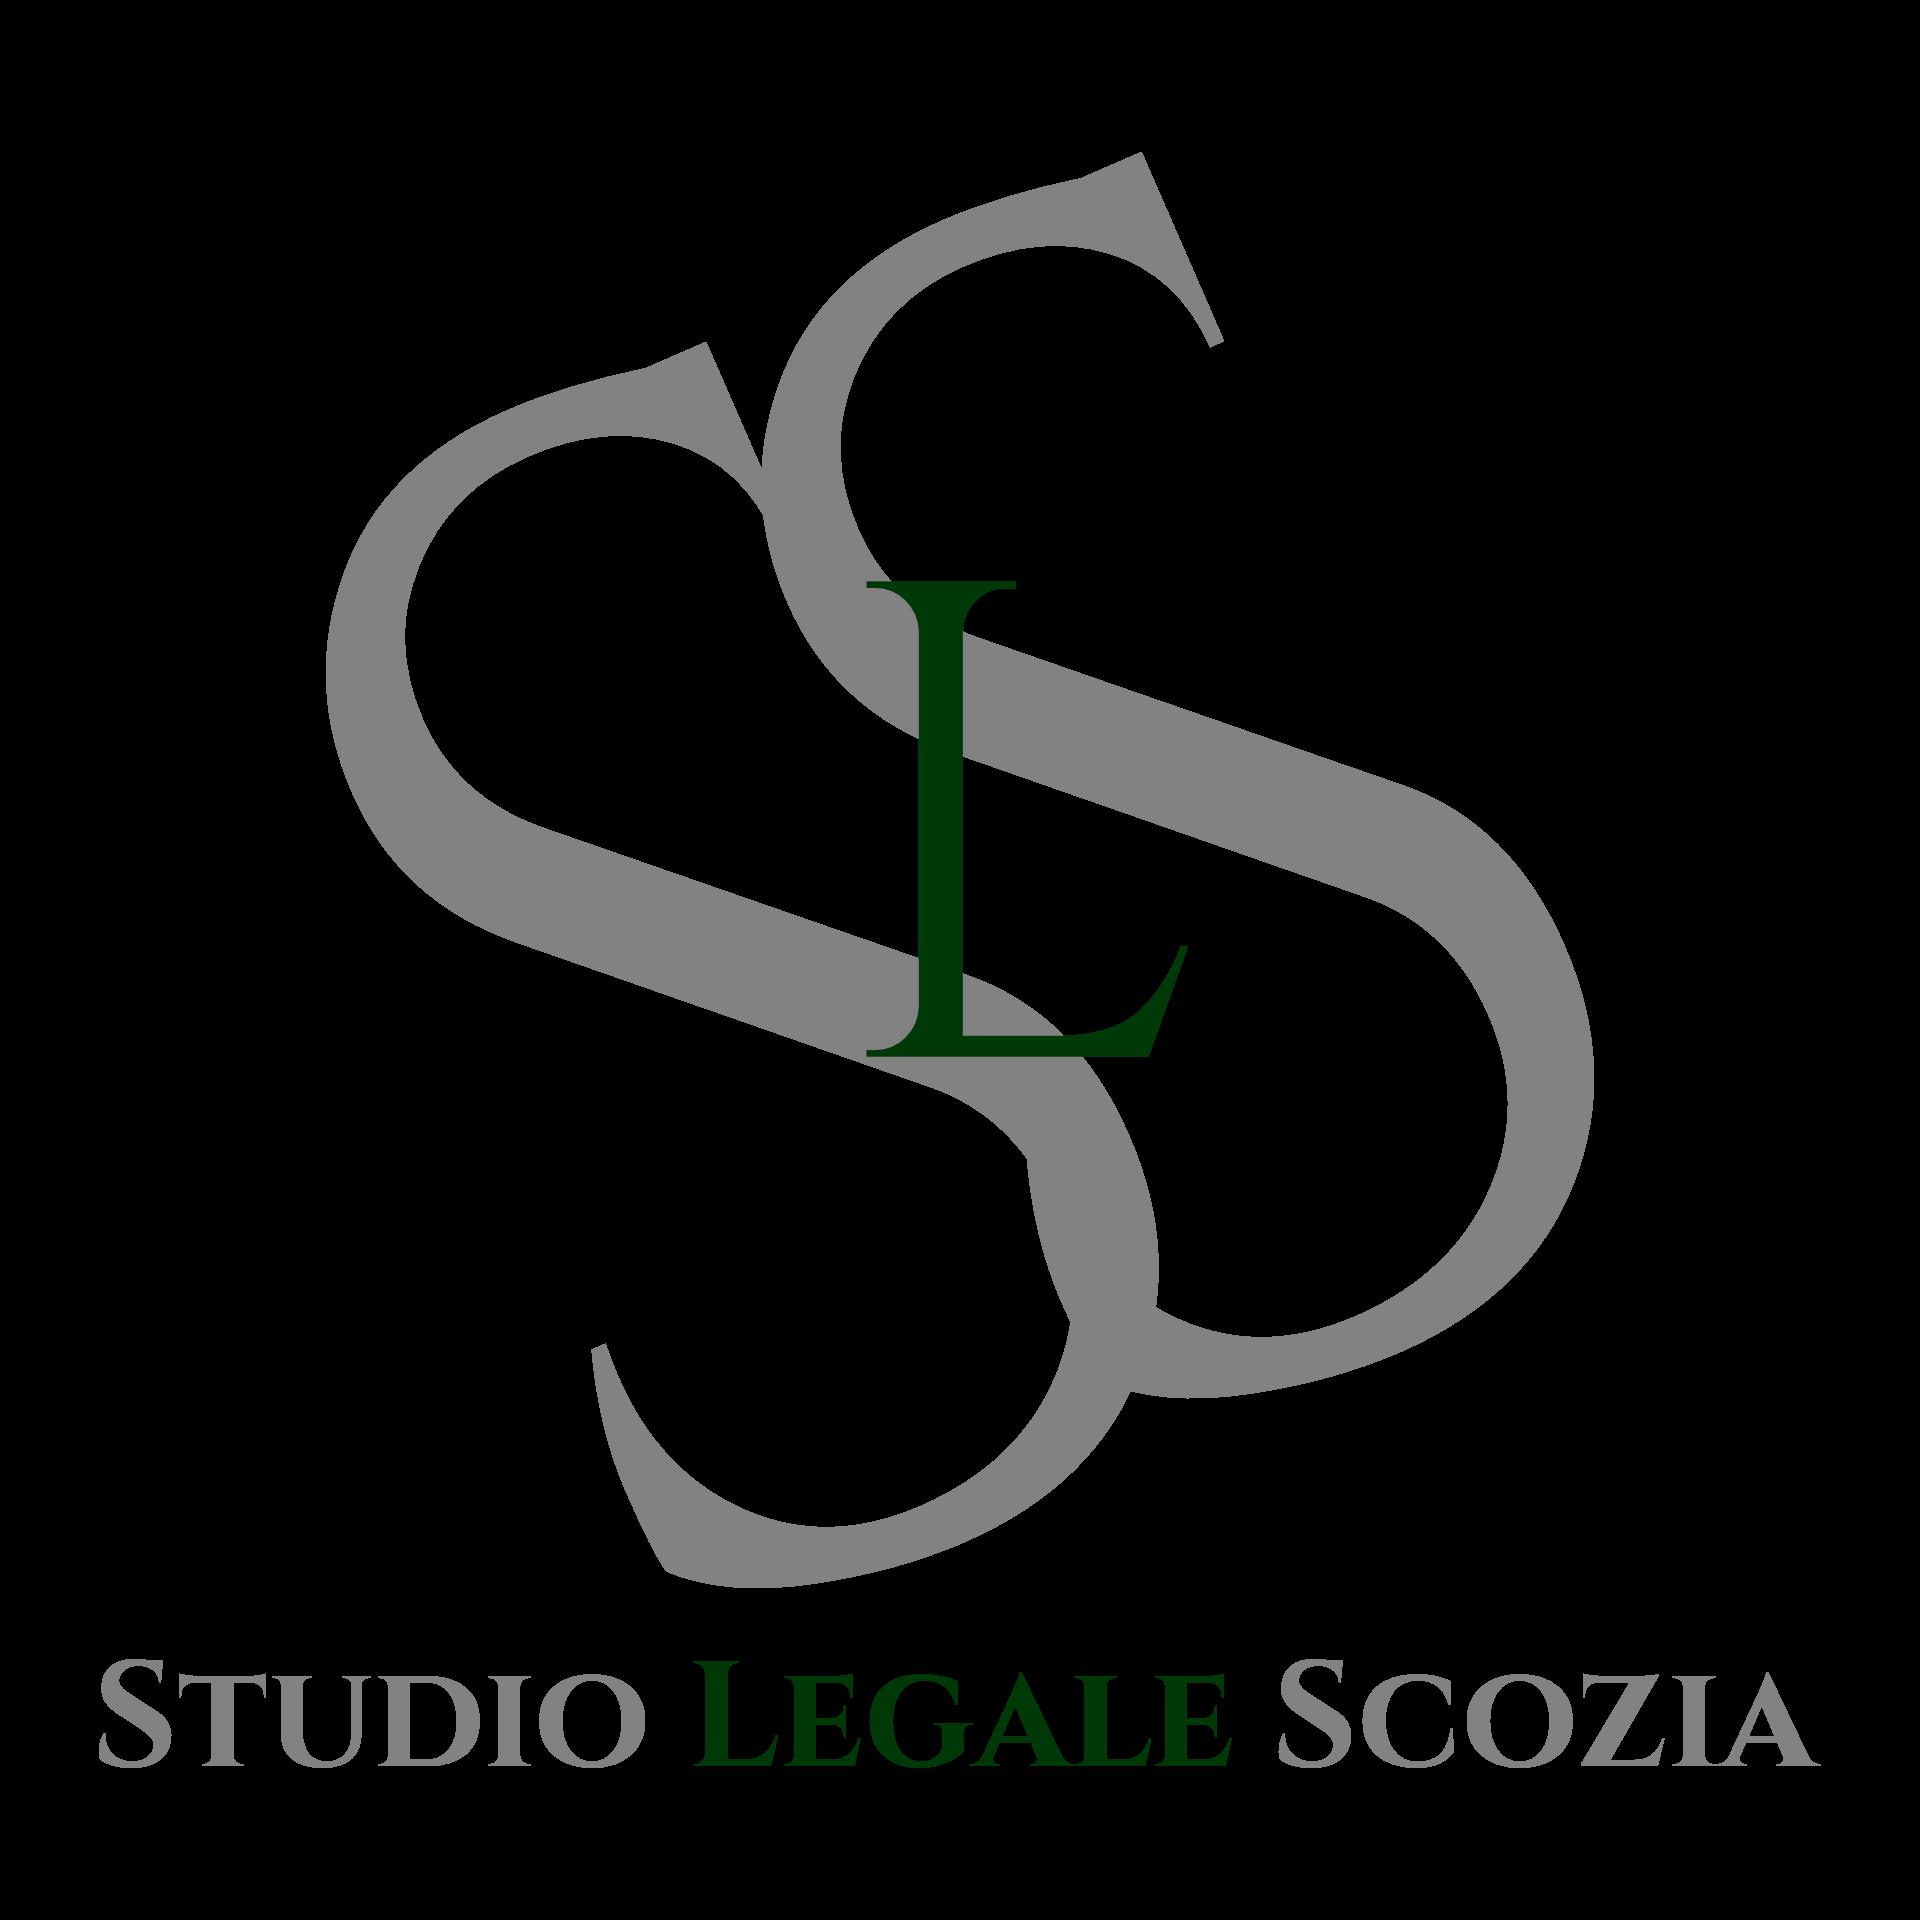 Studio Legale Scozia